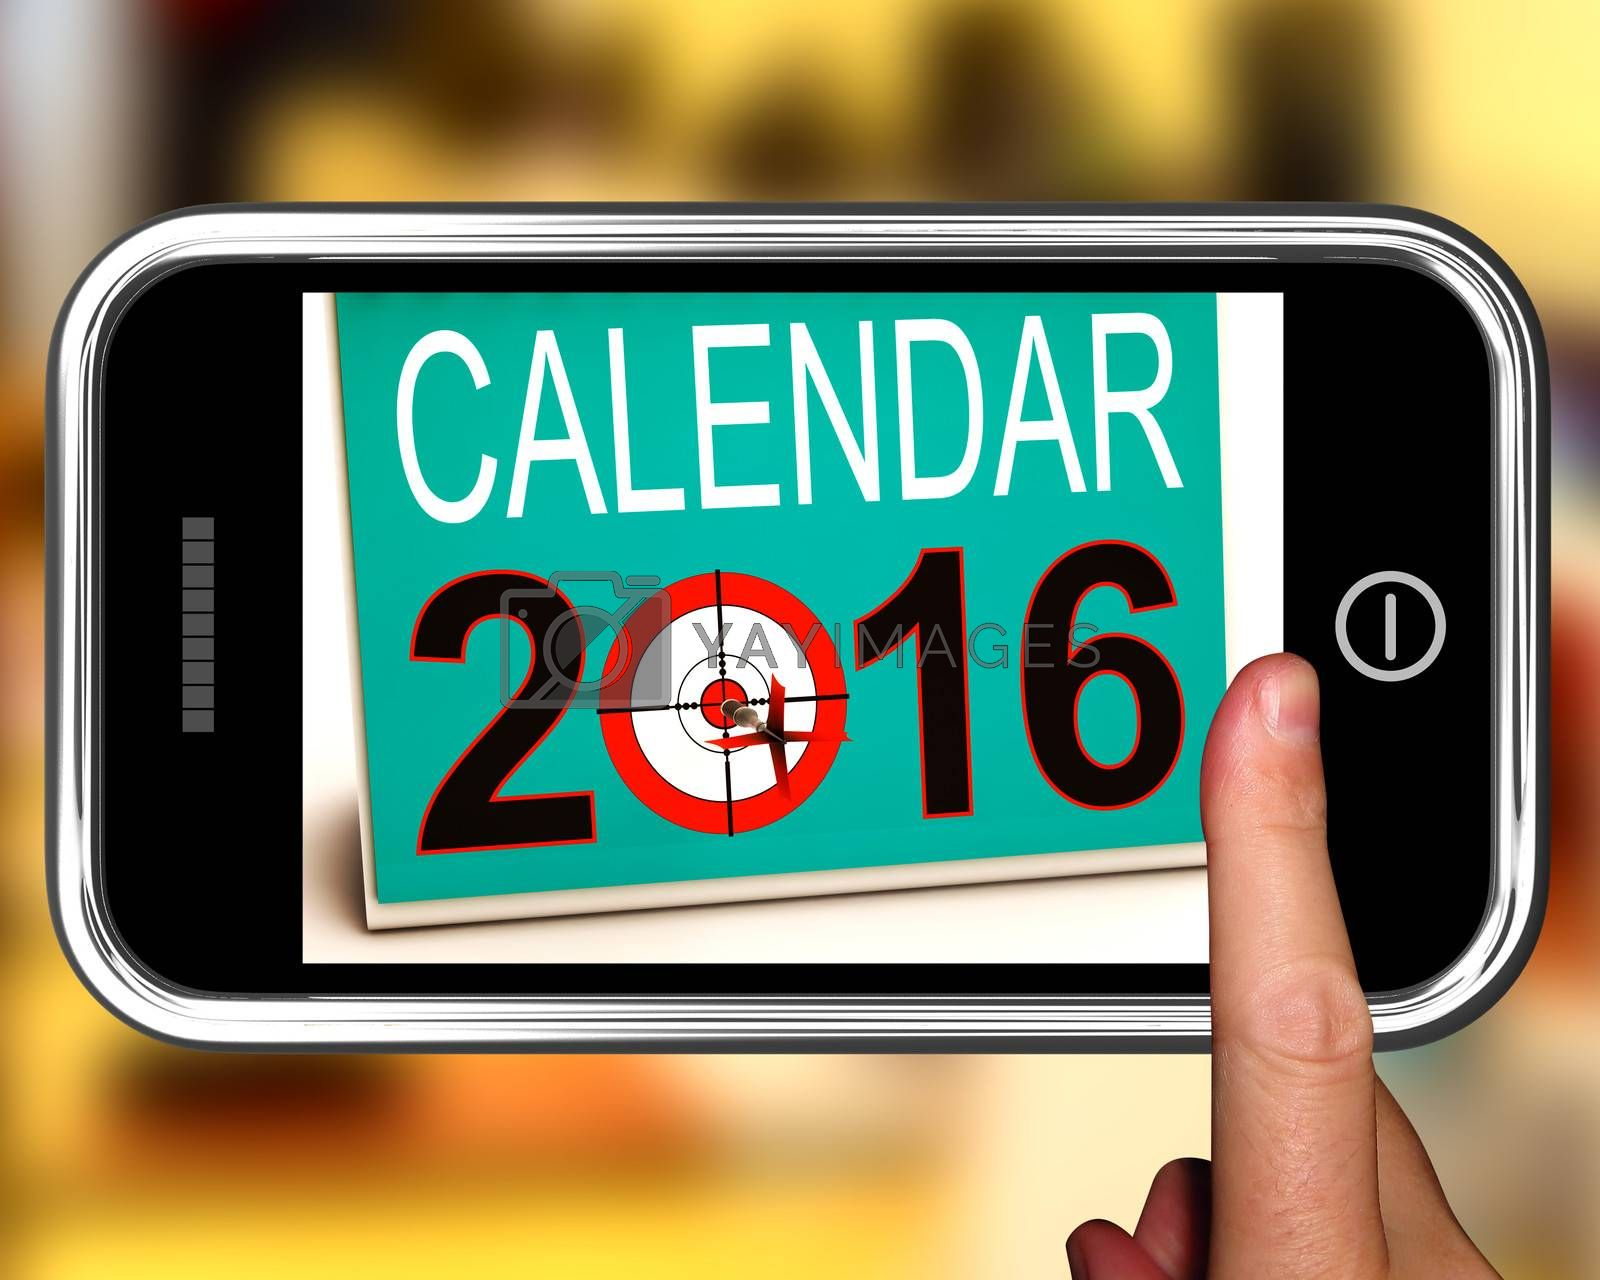 Calendar 2016 On Smartphone Shows Future Calendar Or Annual Planning